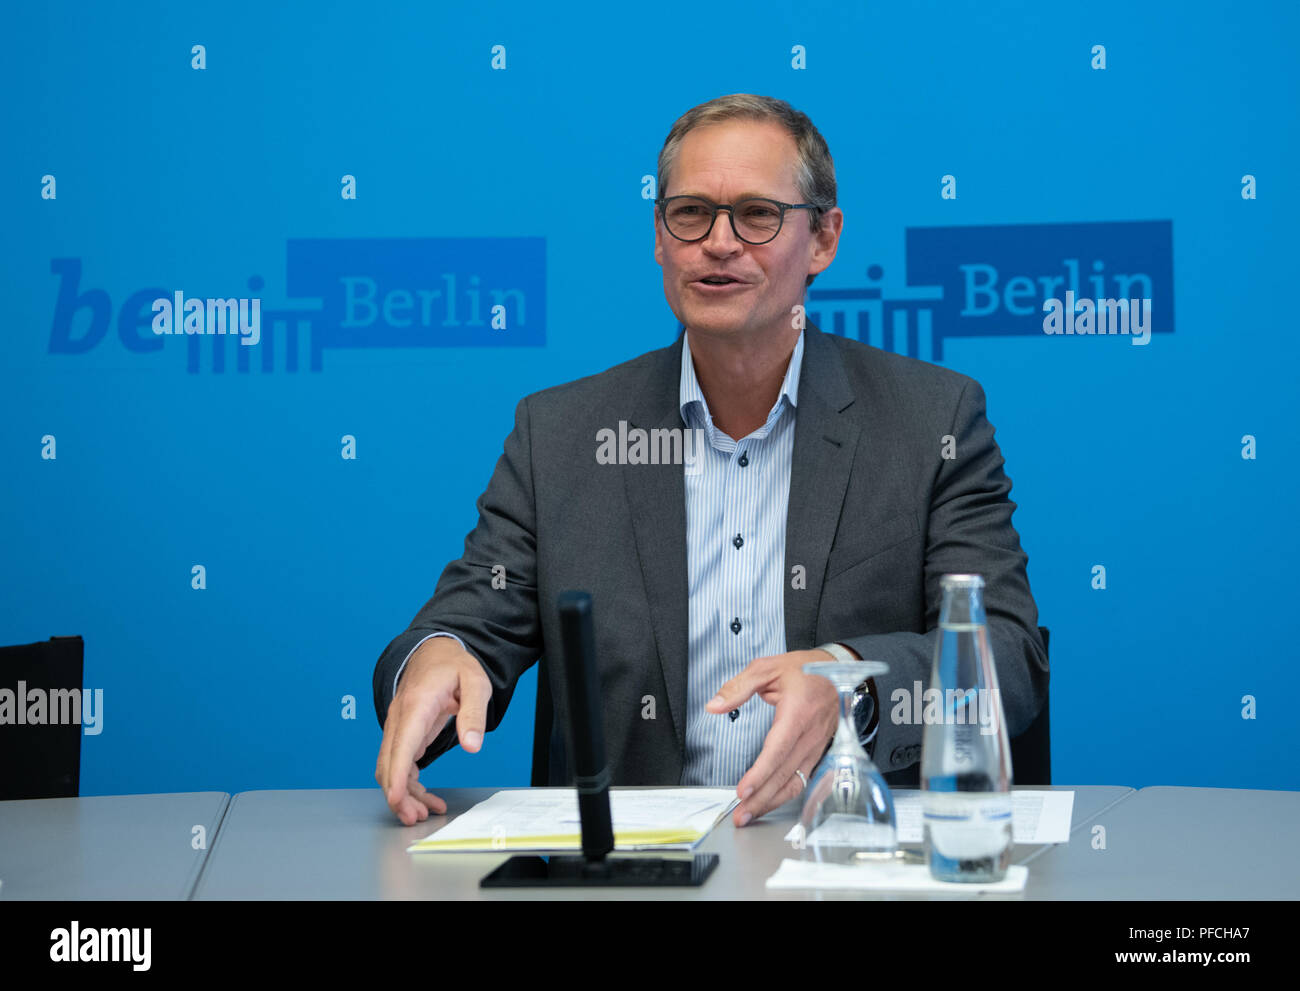 Berlin, Germany. 21st Aug, 2018. Michael Müller (SPD), Governing Mayor of Berlin, addresses journalists after the Senate meeting. Credit: Paul Zinken/dpa/Alamy Live News - Stock Image